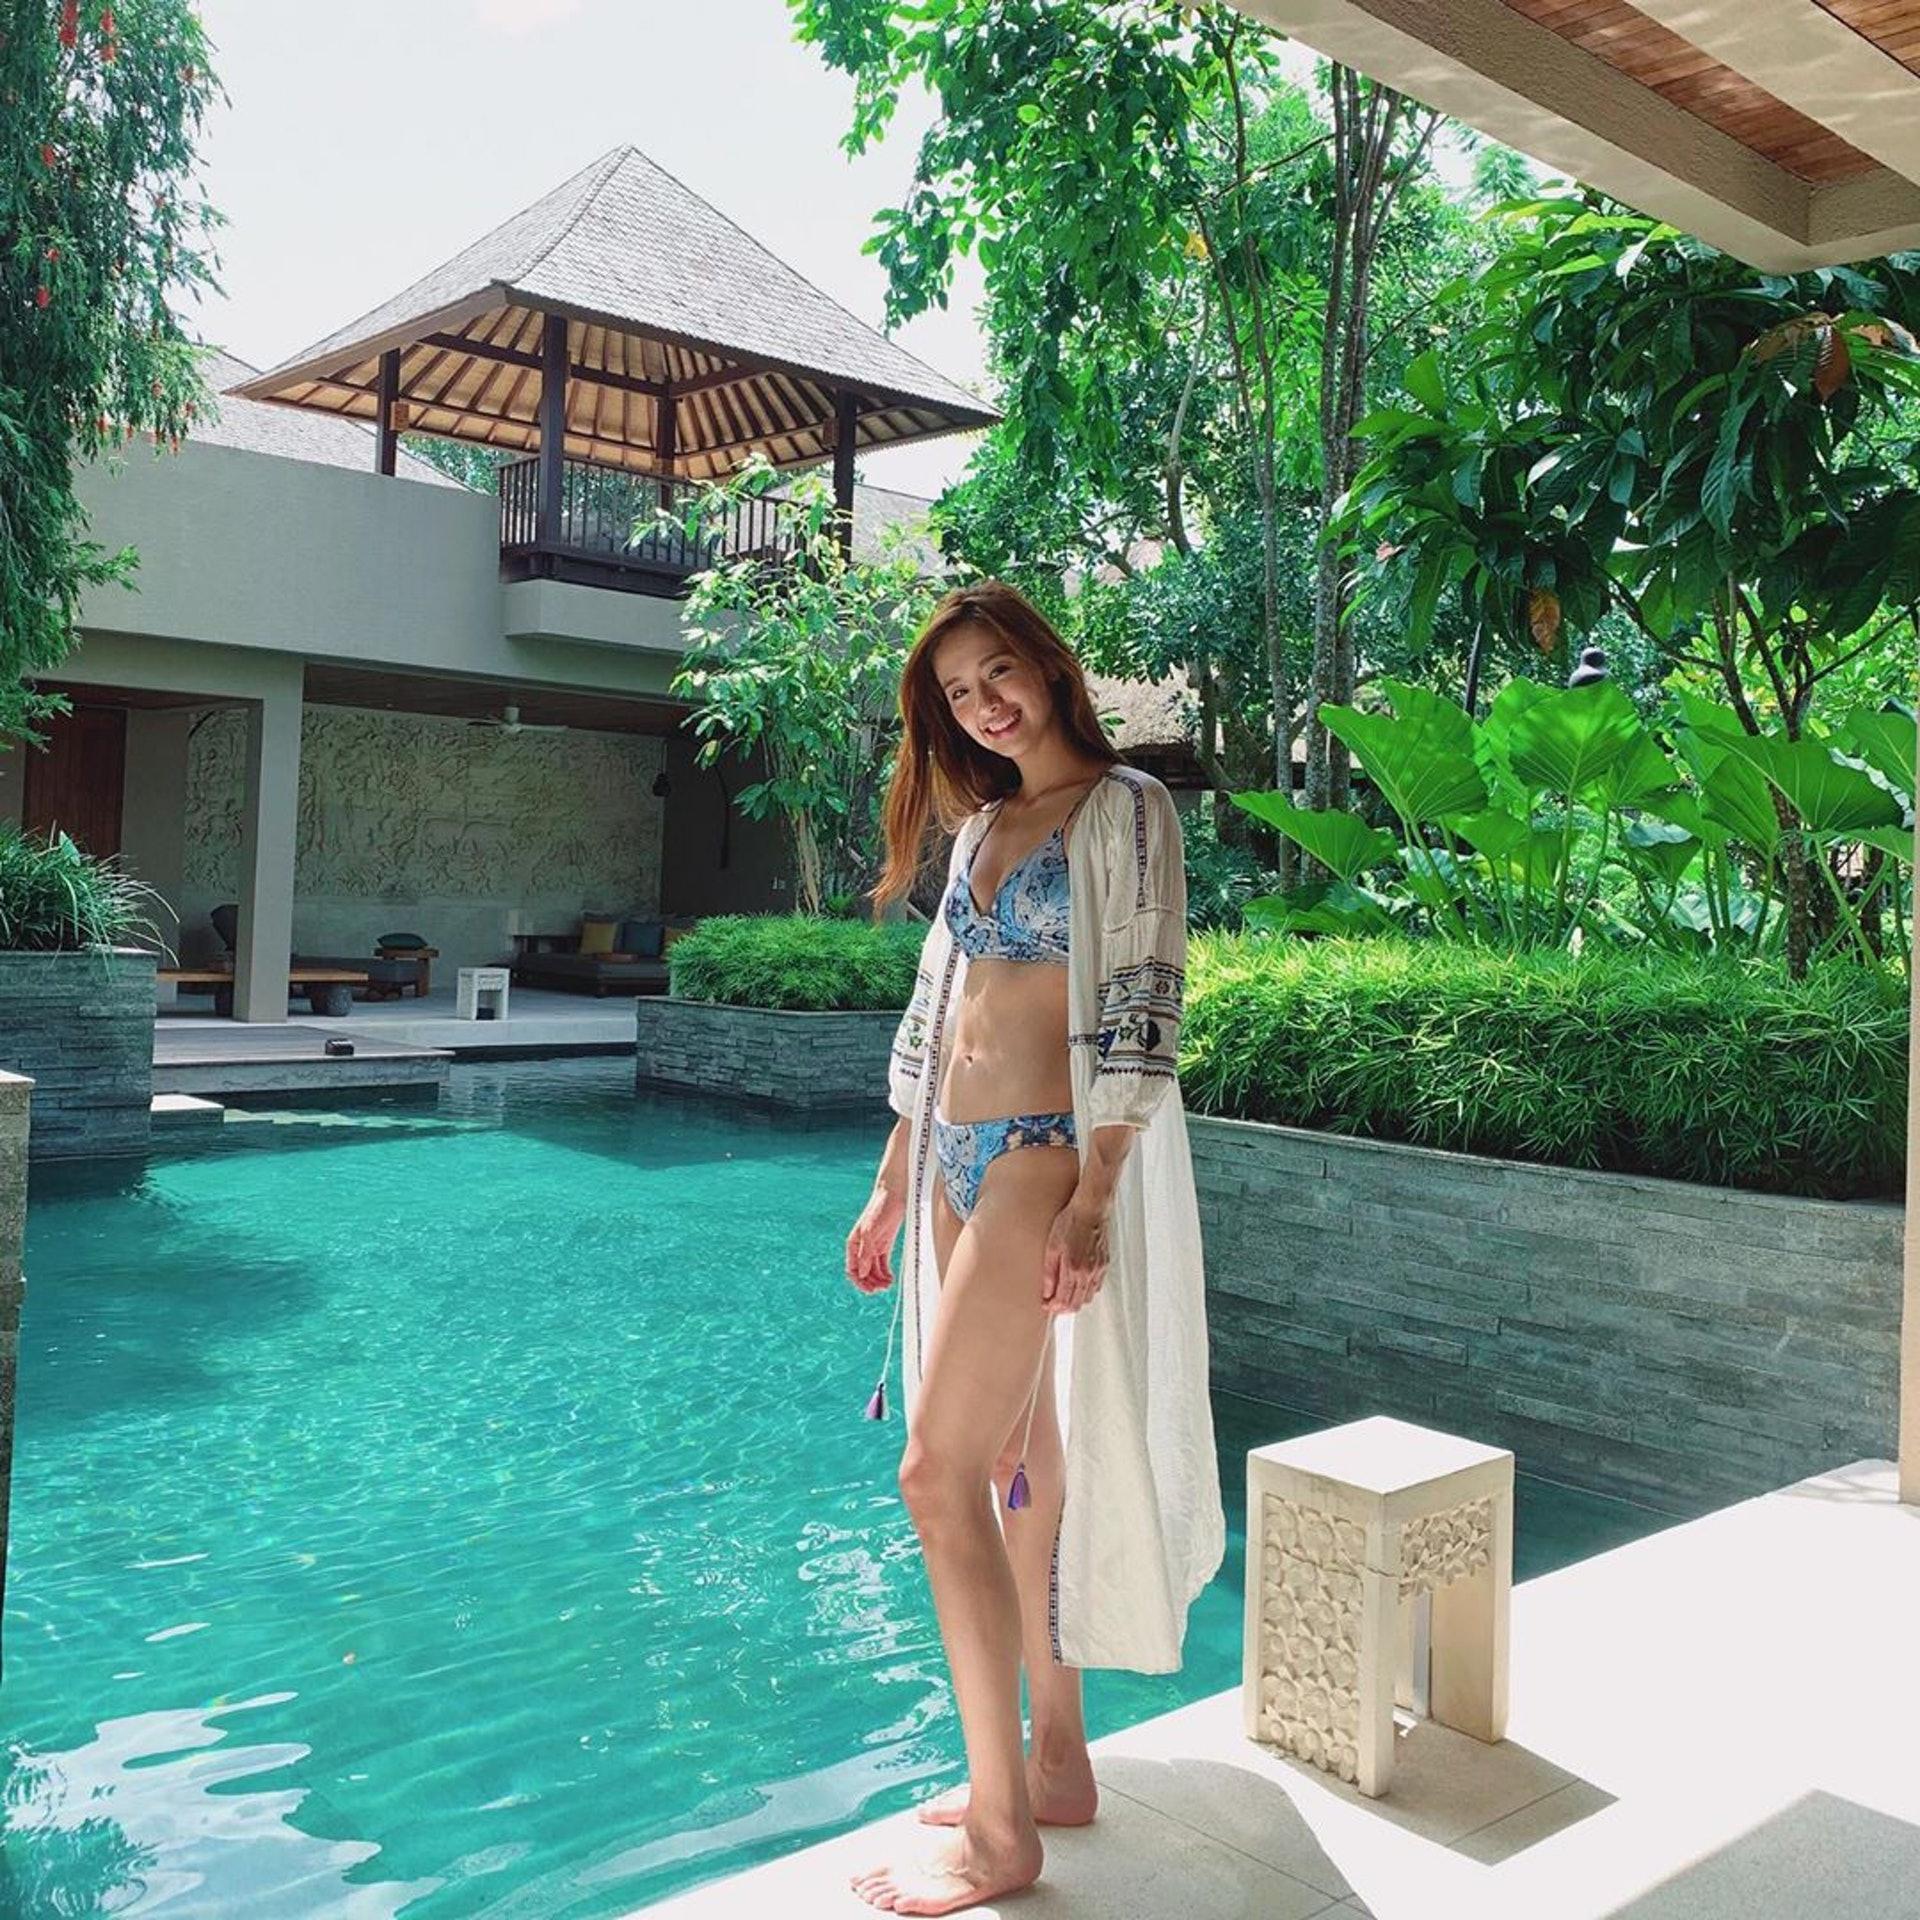 Jumbo曾淑雅日前到峇里享受陽光與海灘。(IG圖片 / jumbotsang)